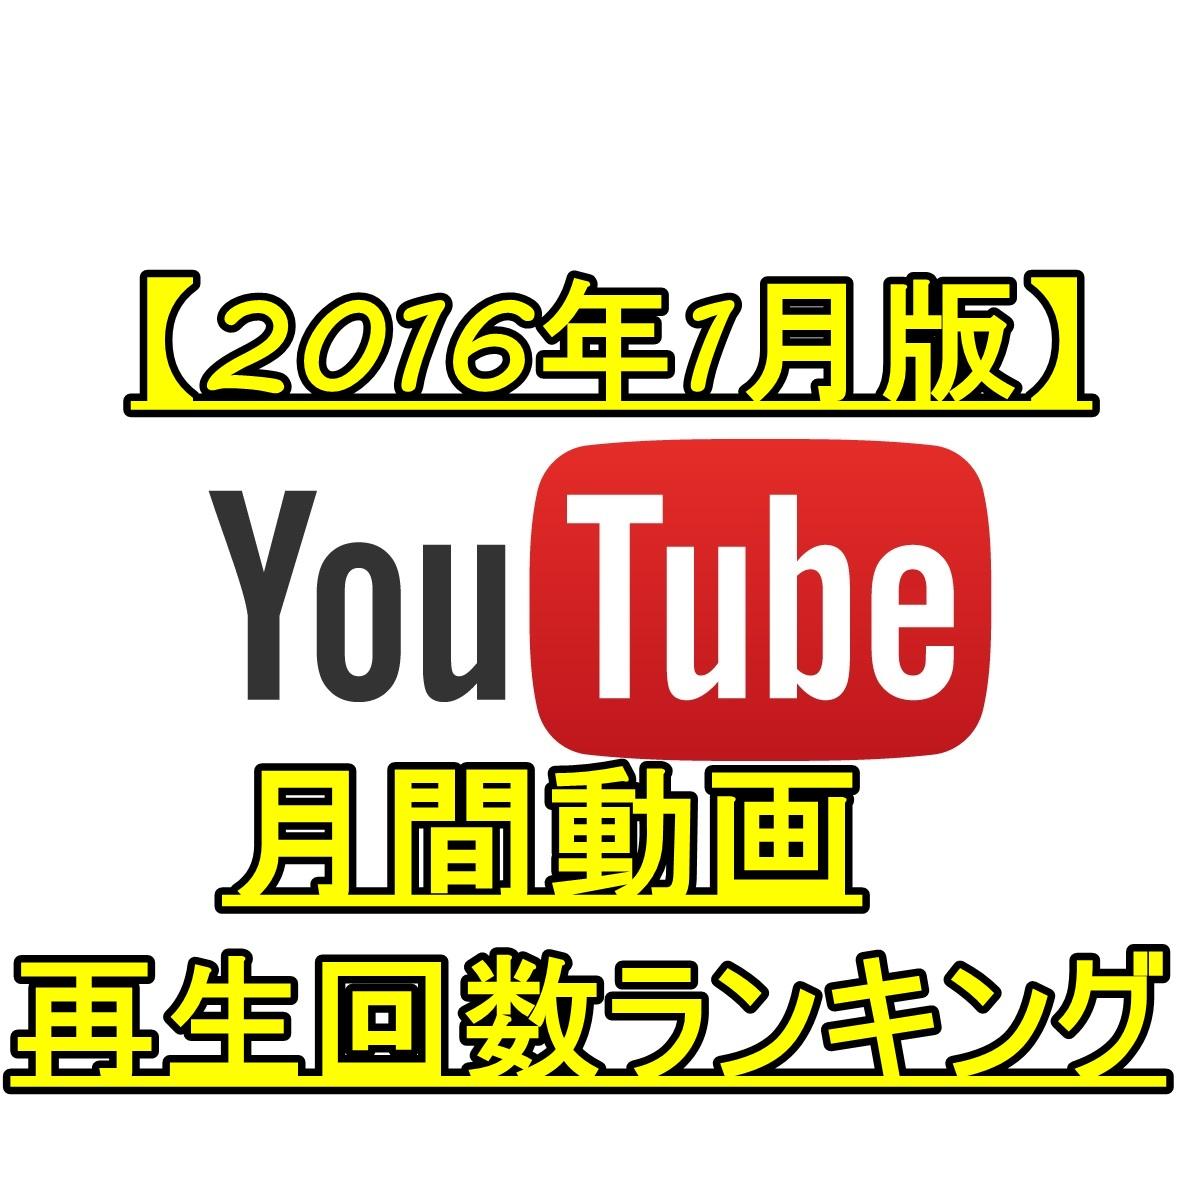 YouTube2016年1月 最新動画再生回数ランキング02